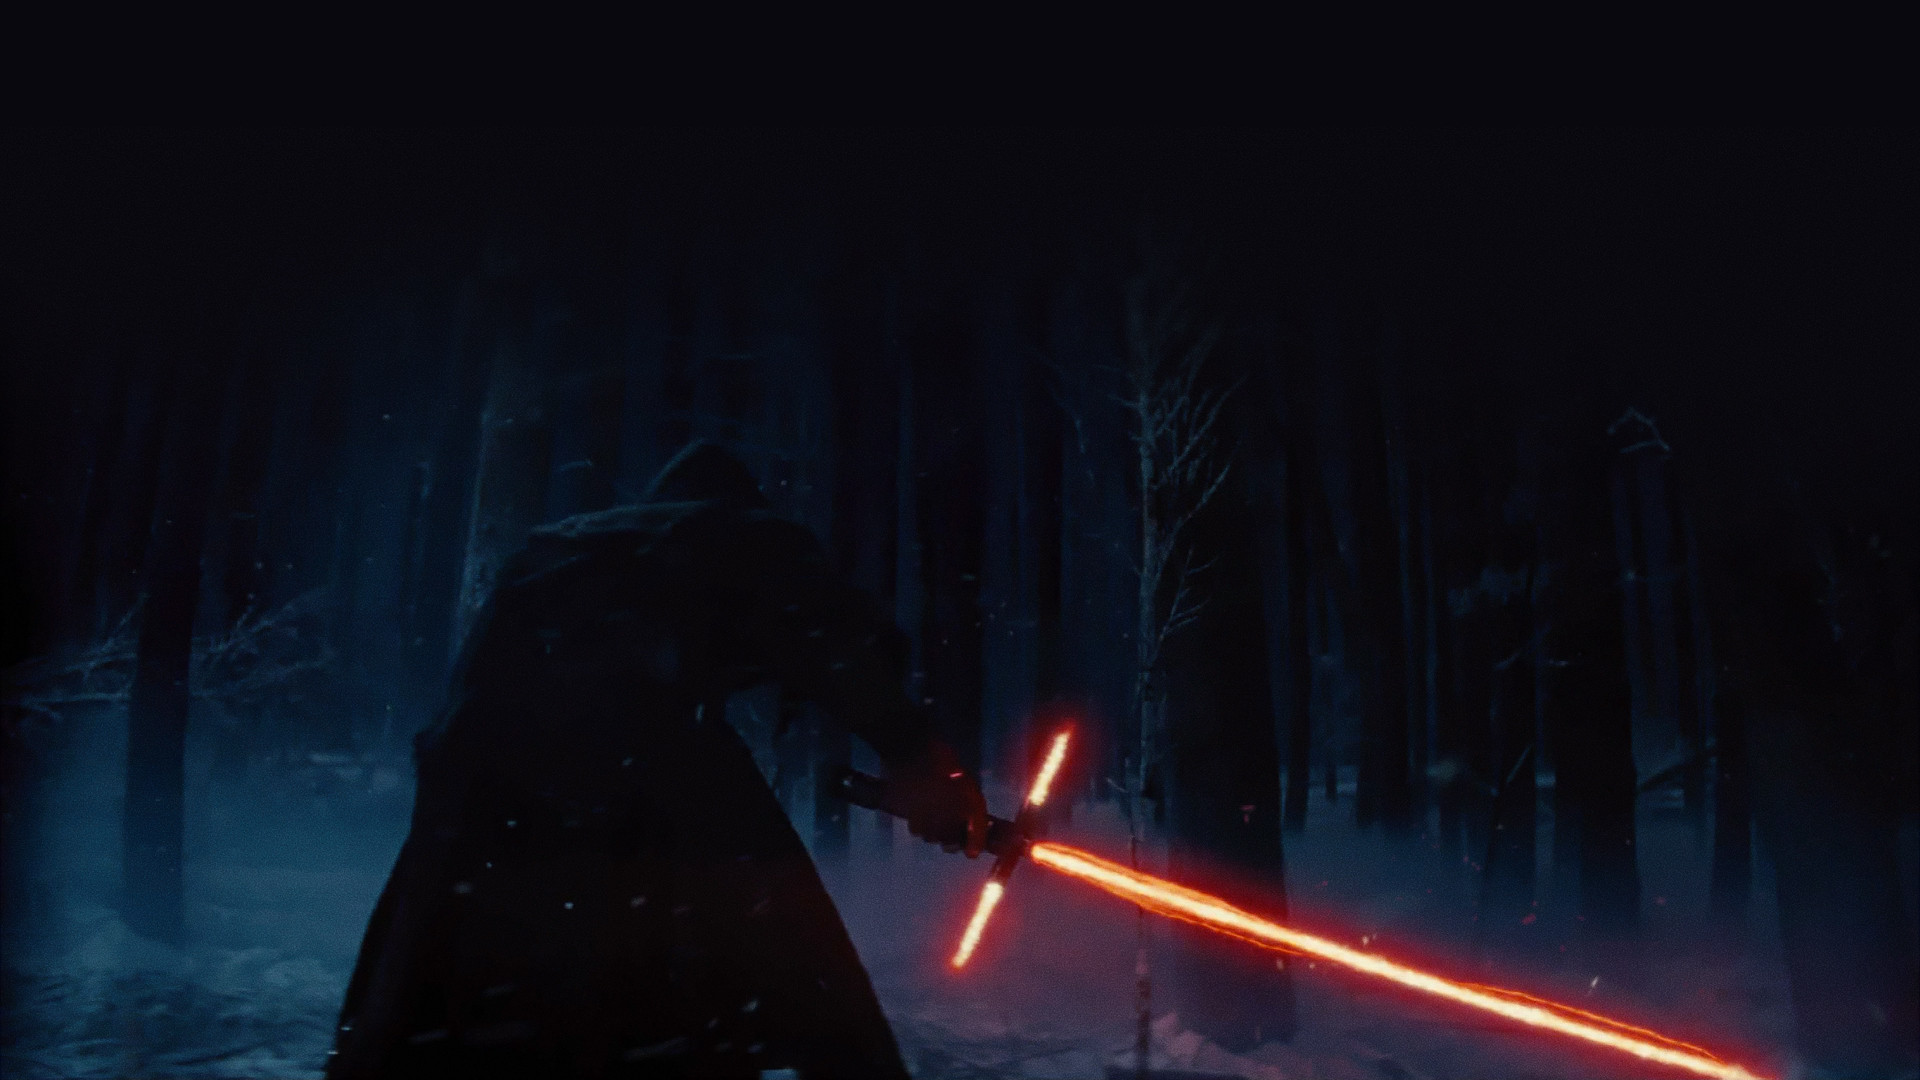 Star Wars Background Wallpaper Wallpapertag